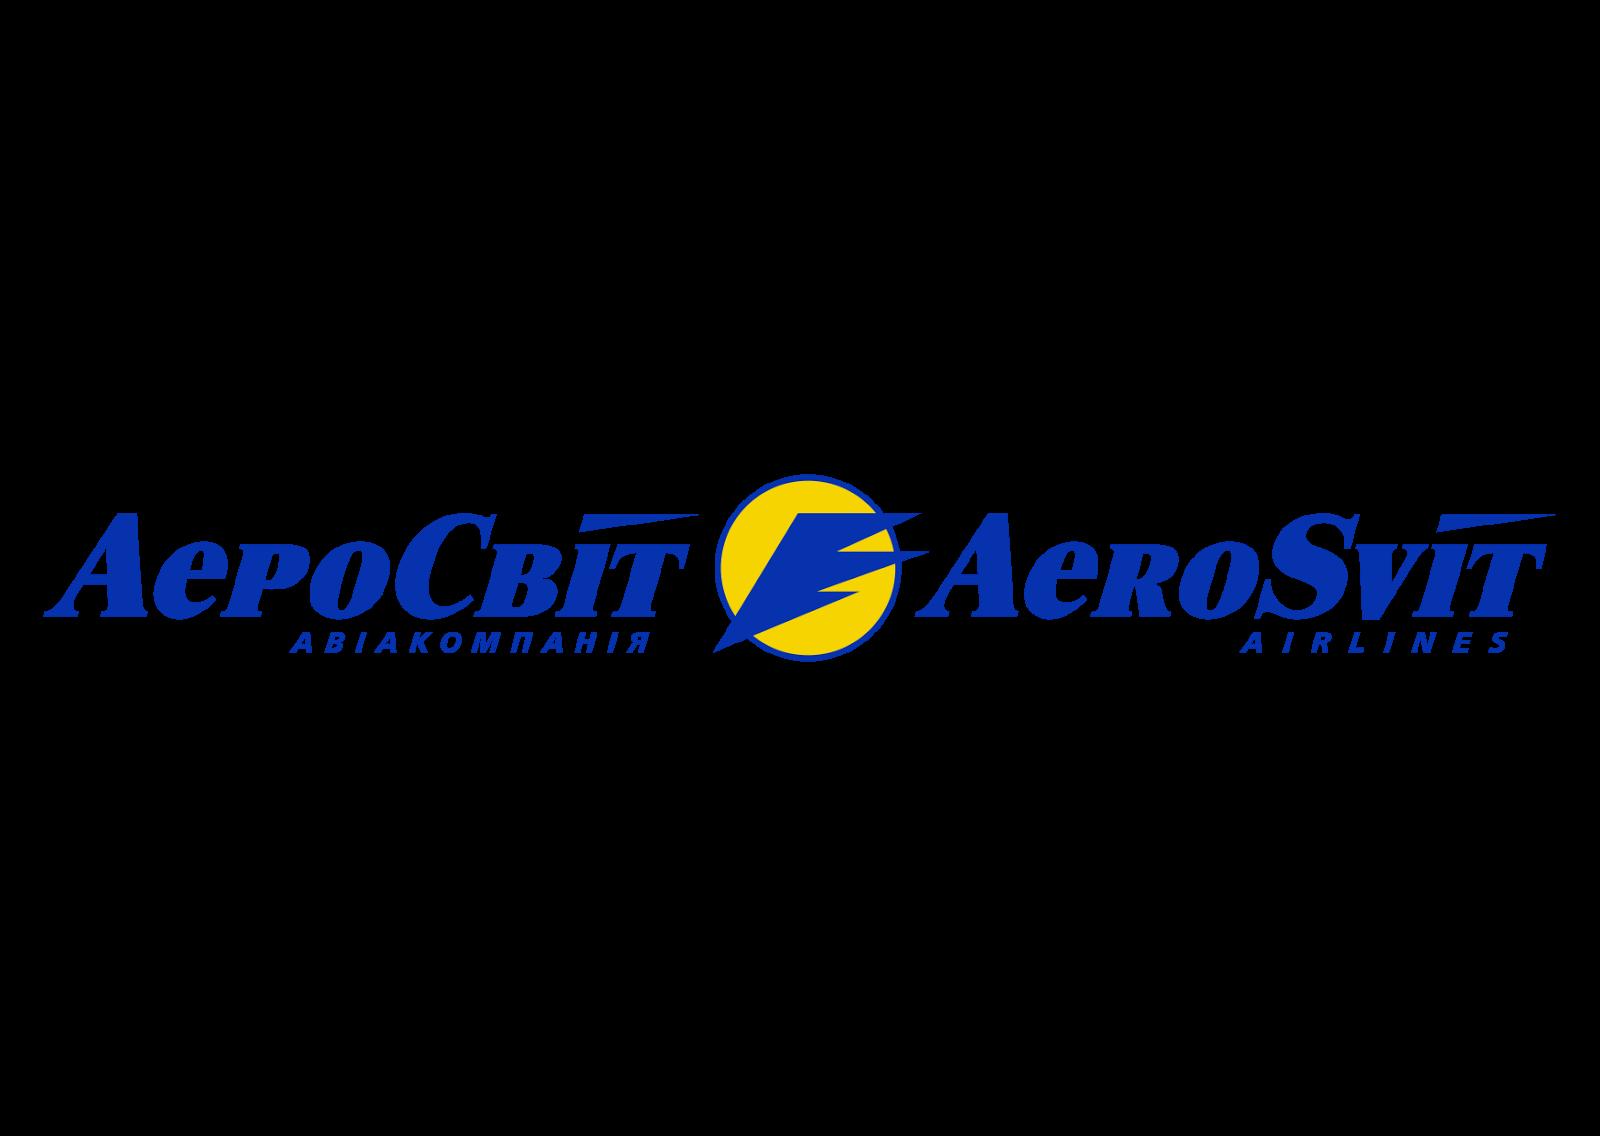 AeroSvit Airlines Logo Vector - Aerosvit Airlines Logo PNG